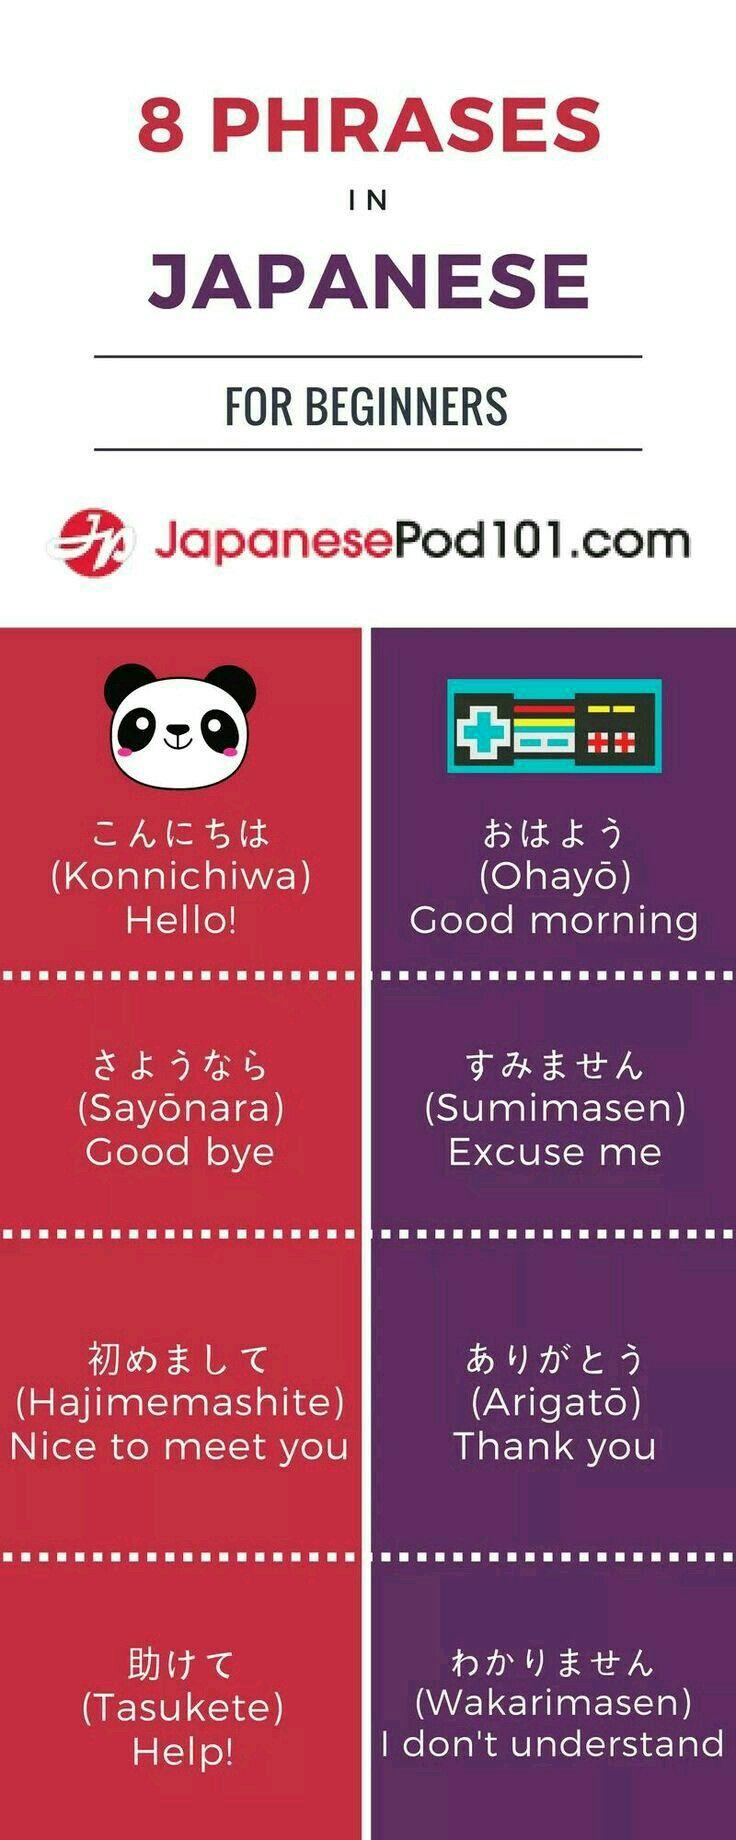 Frases japonesas por rinko shirokane en japanese